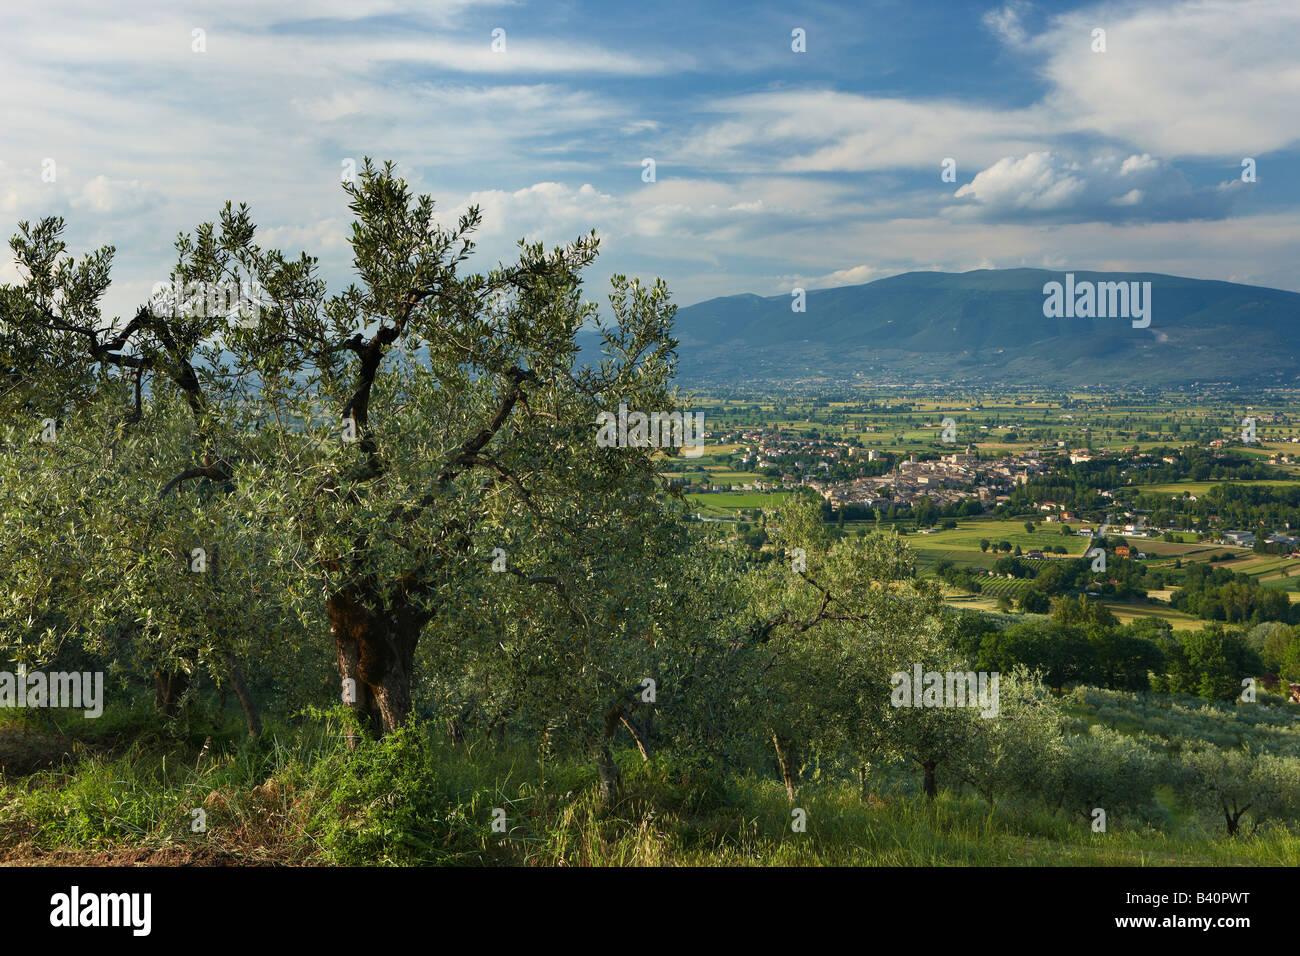 ein Olivenhain mit Blick auf Bevagna und Val di Spoleto, Umbrien, Italien Stockbild